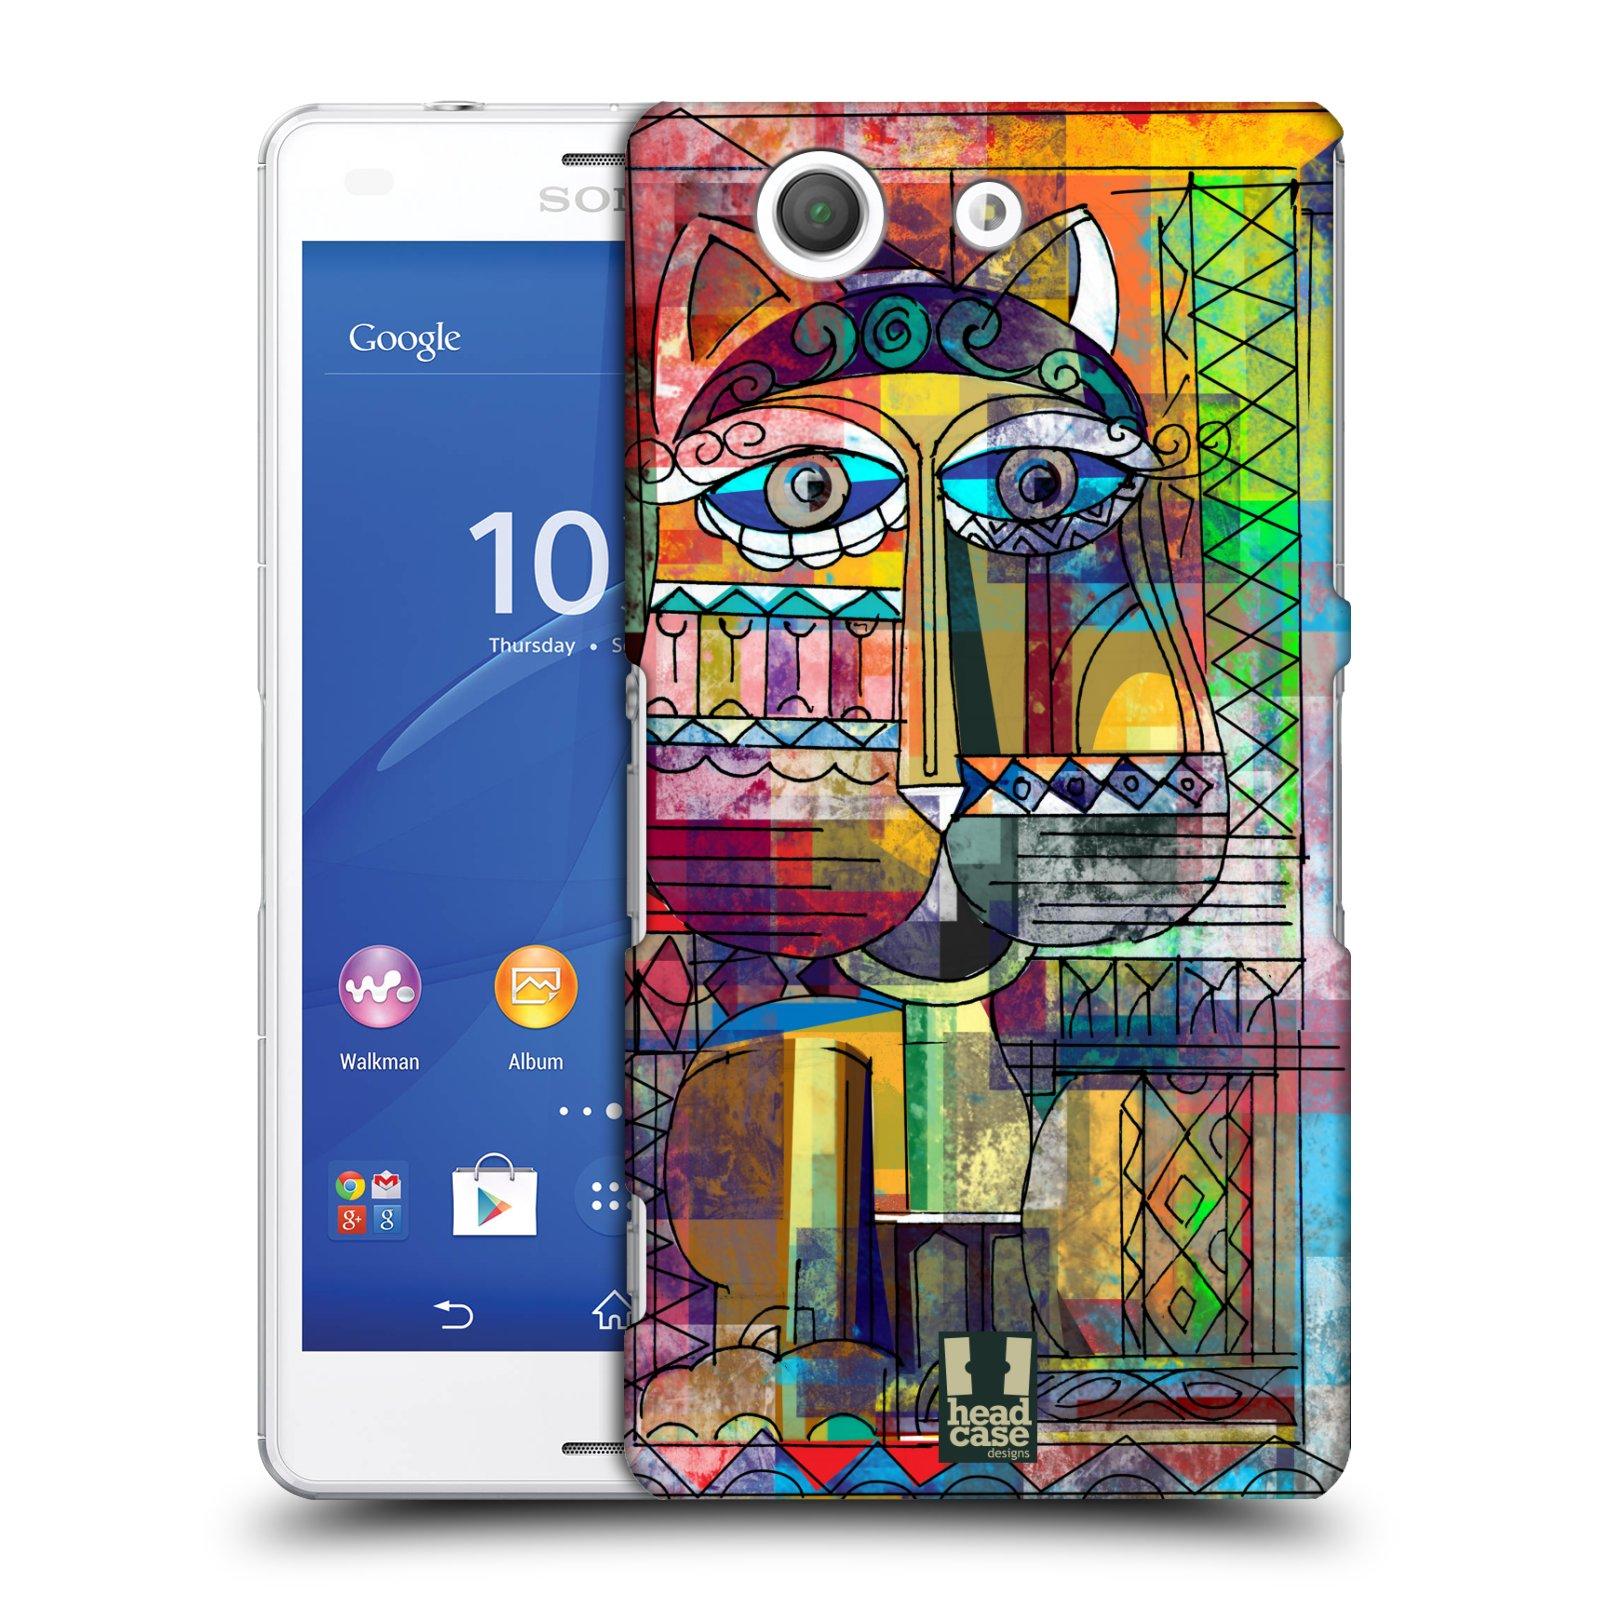 Plastové pouzdro na mobil Sony Xperia Z3 Compact D5803 HEAD CASE AZTEC KORAT